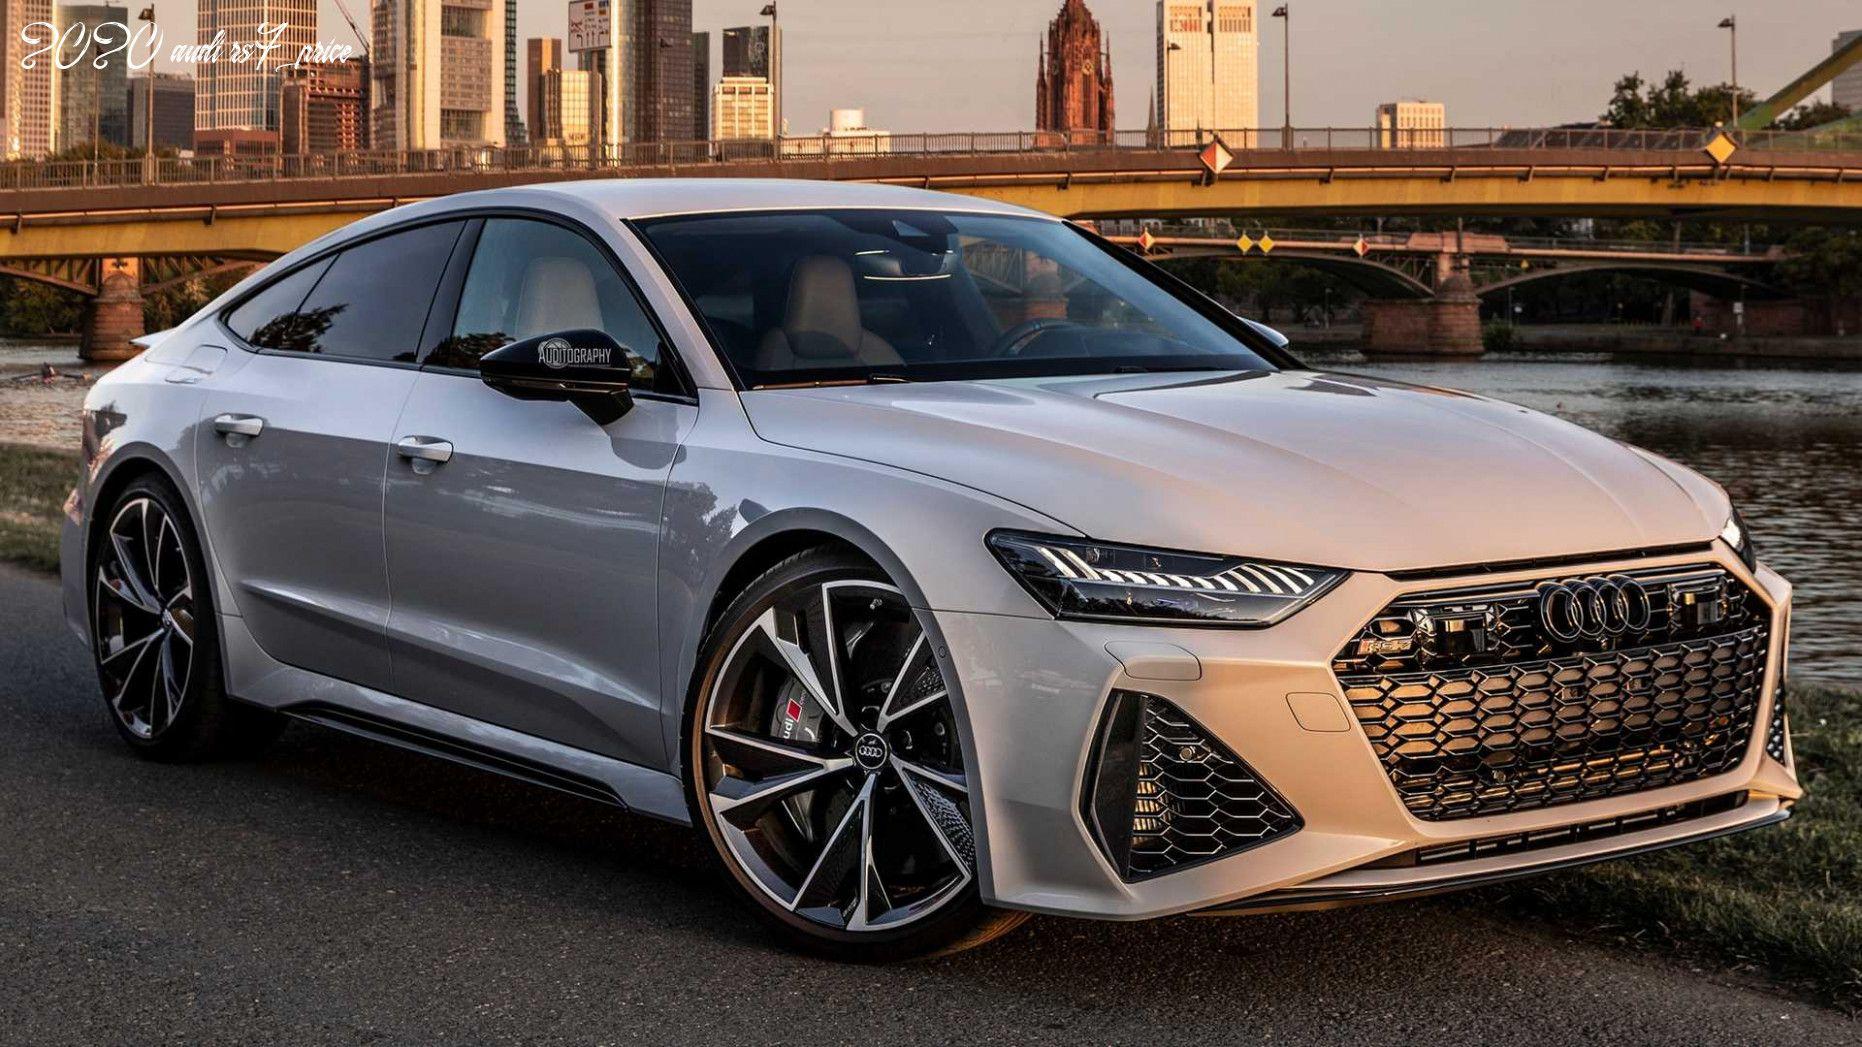 2020 Audi Rs7 Price Nel 2020 Audi Tt Audi Audi A3